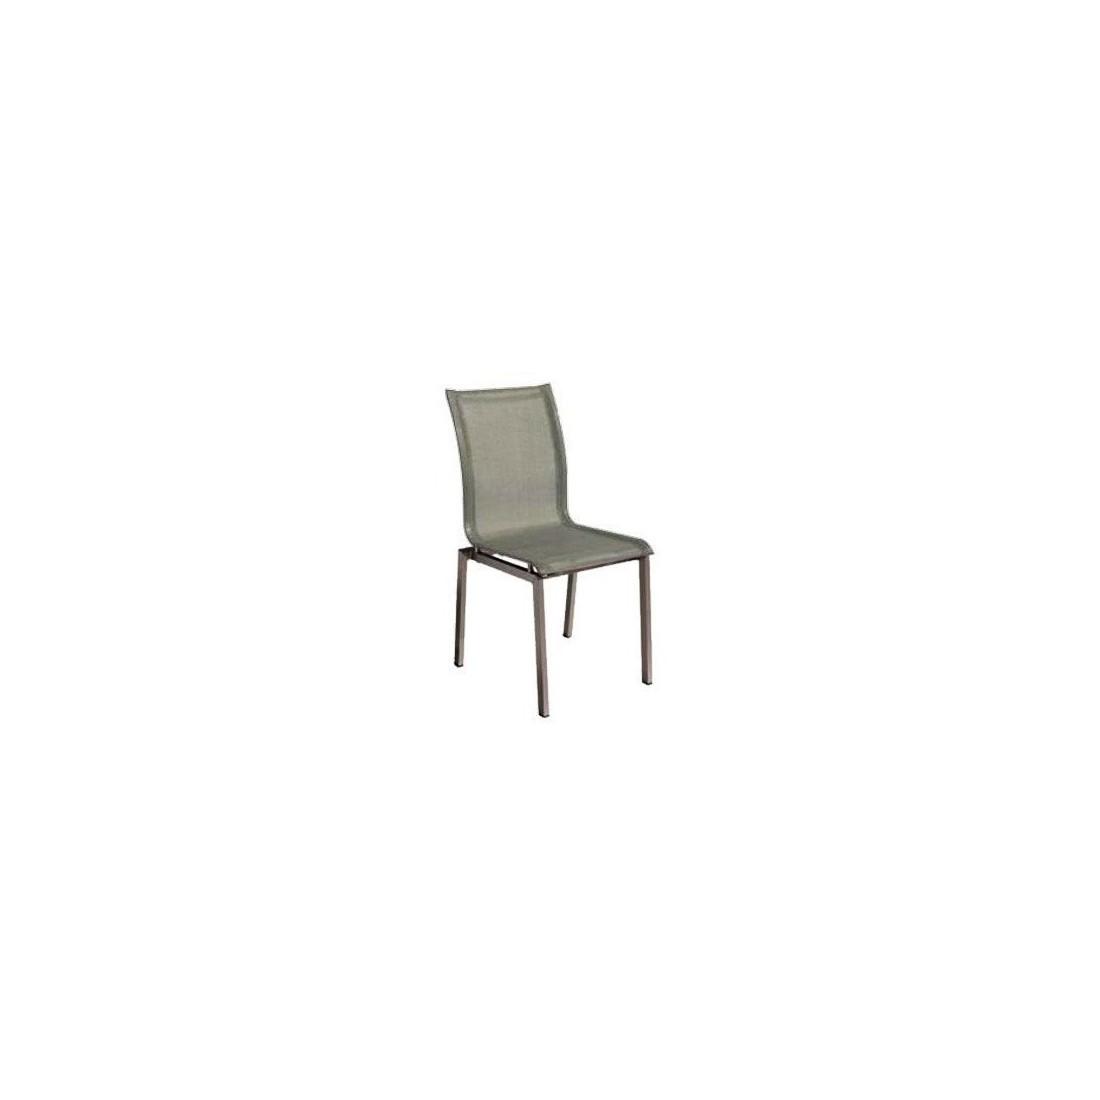 Chaise kettler blanche best chaises dsw blanches images for Chaise kettler blanche